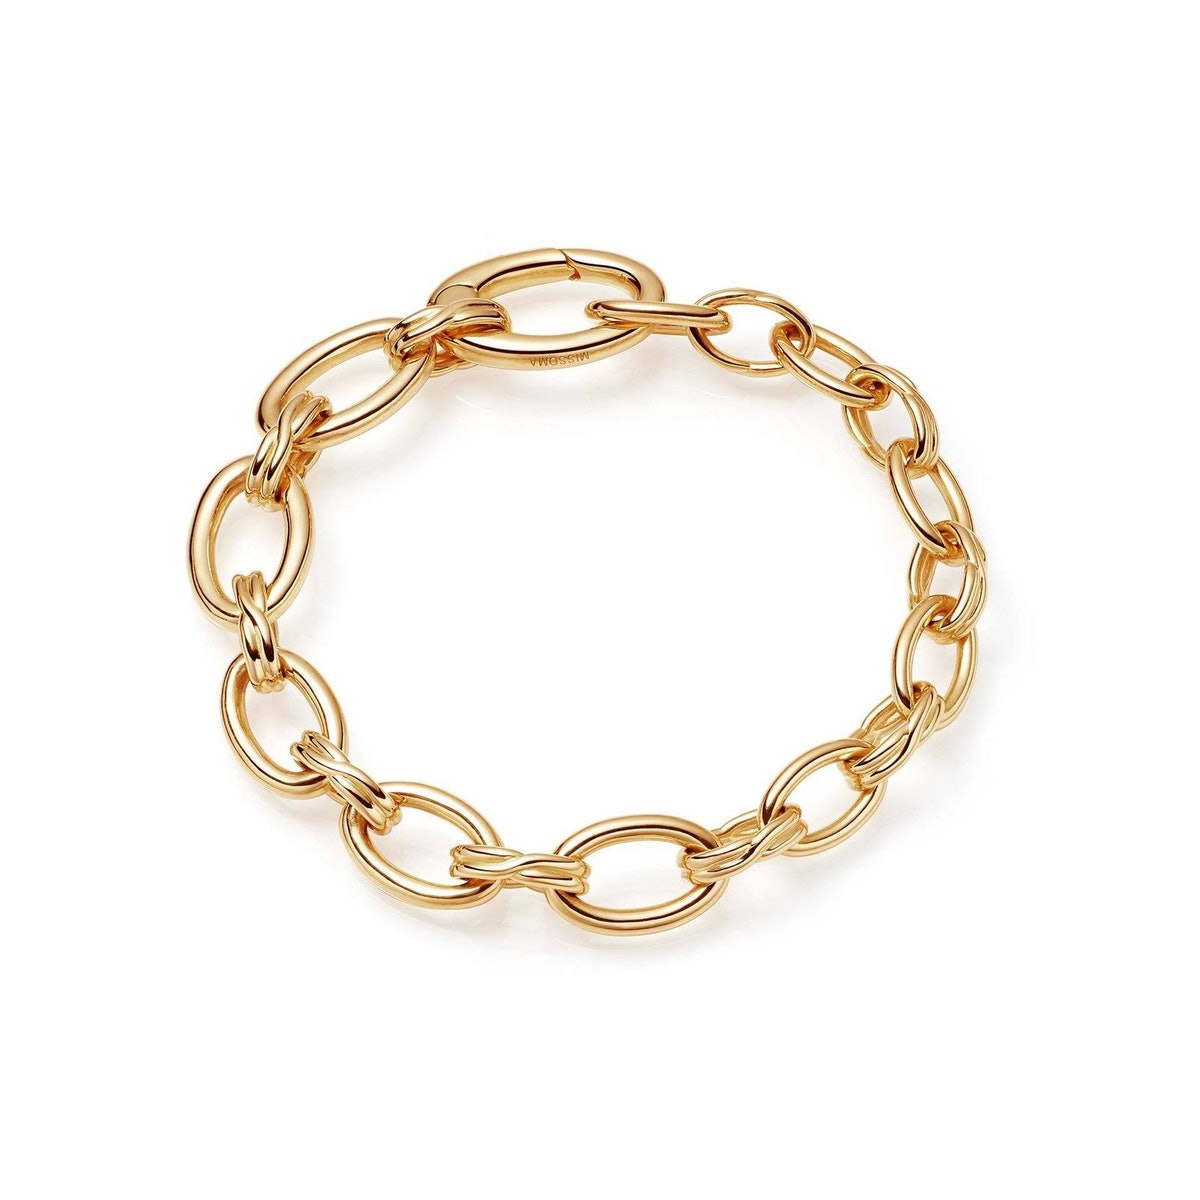 Graduated Oval Chain Bracelet